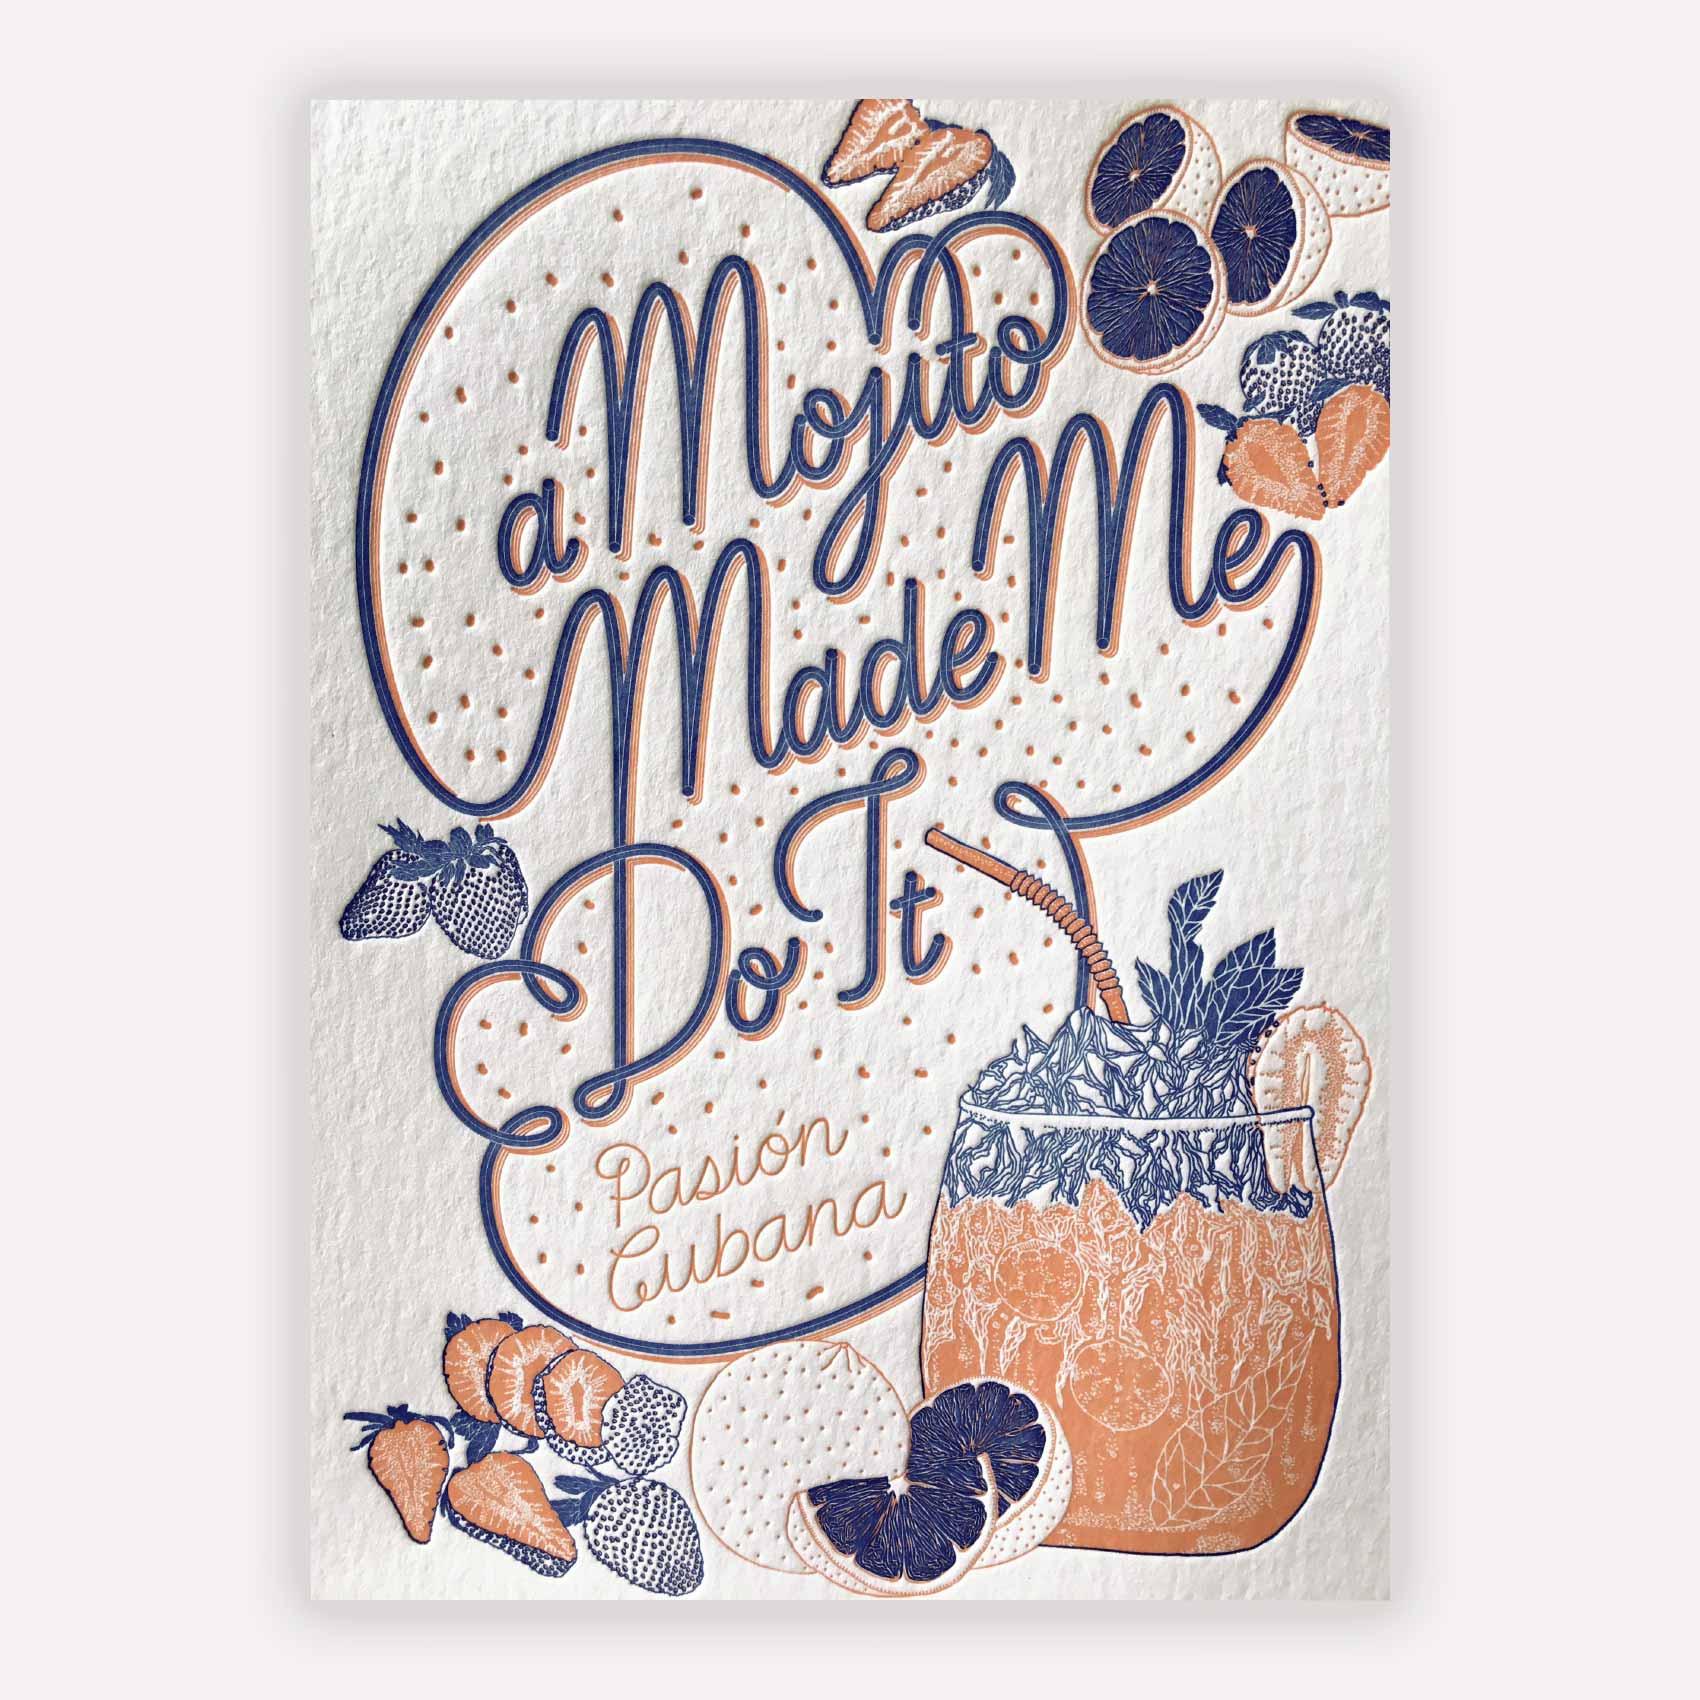 Maria-Montes-Mojito.jpg